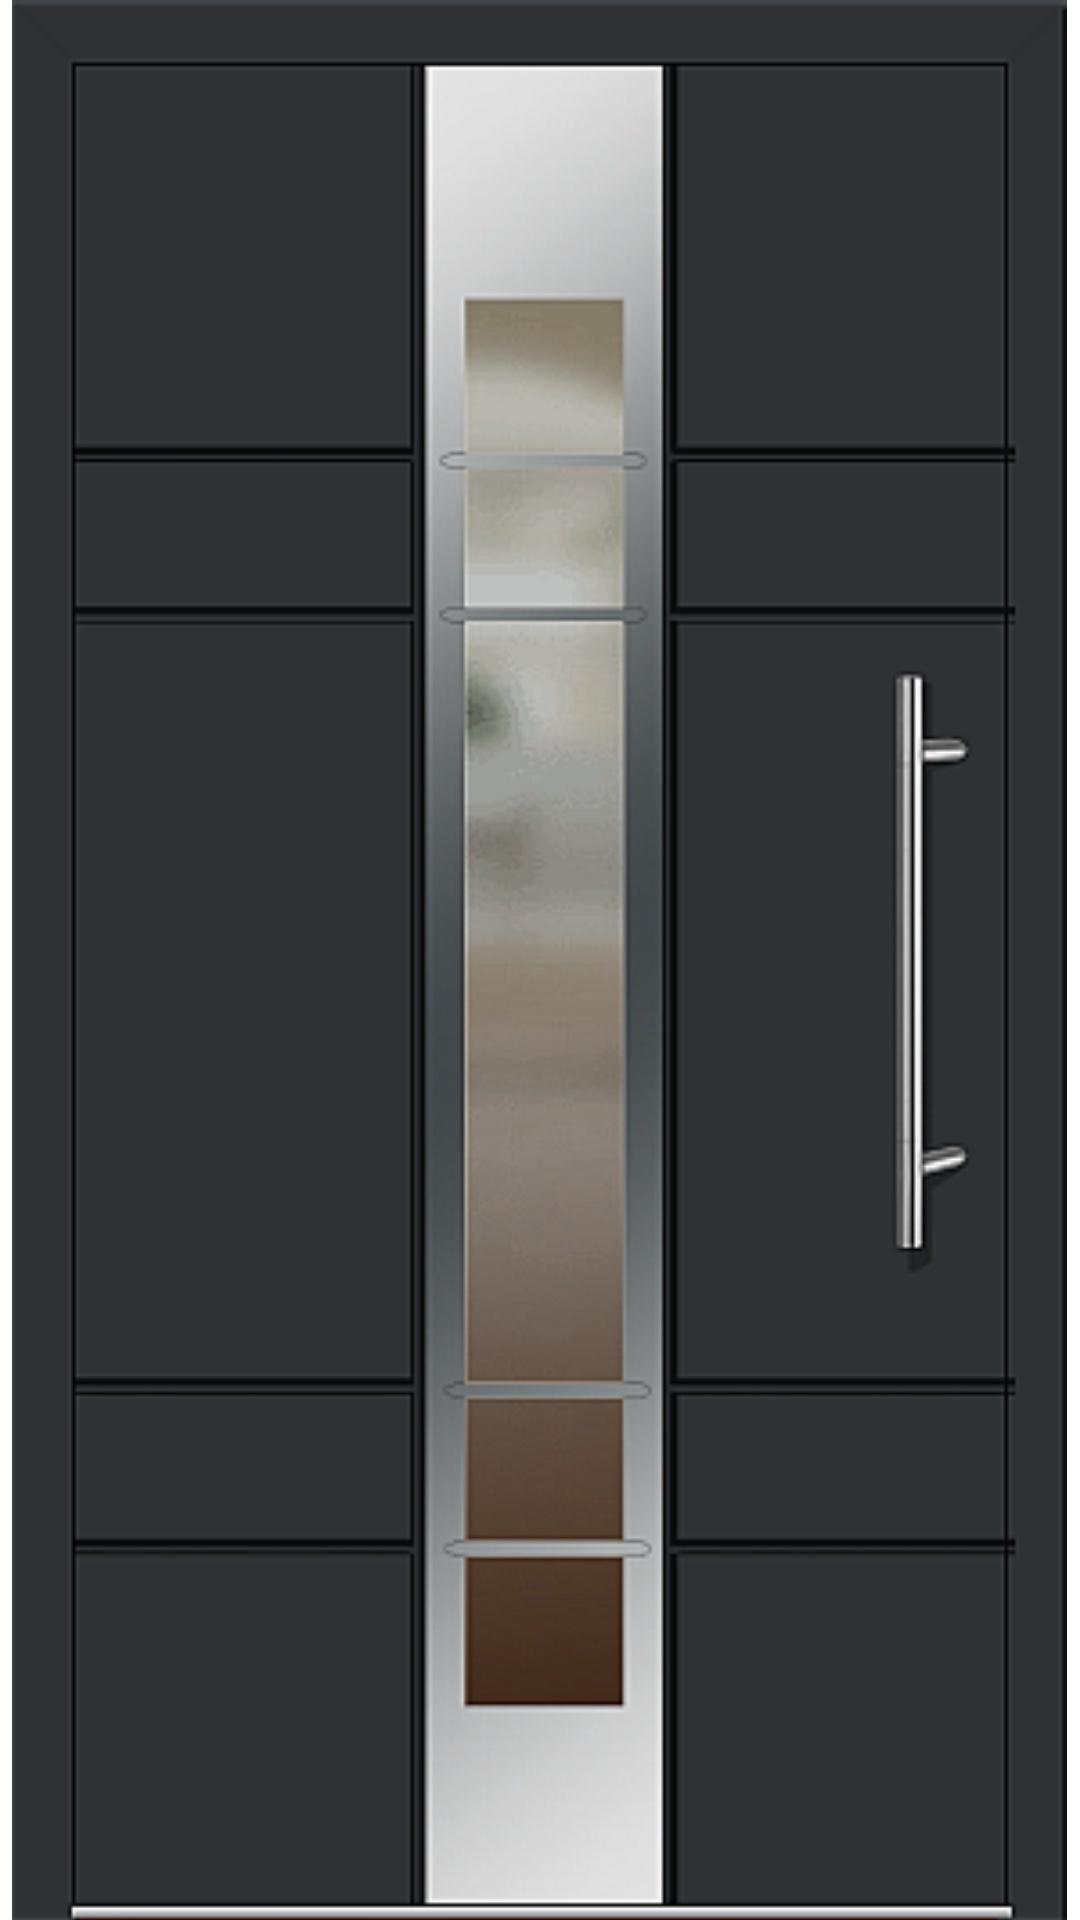 Aluminium Haustür Modell 2700-79 schwarz